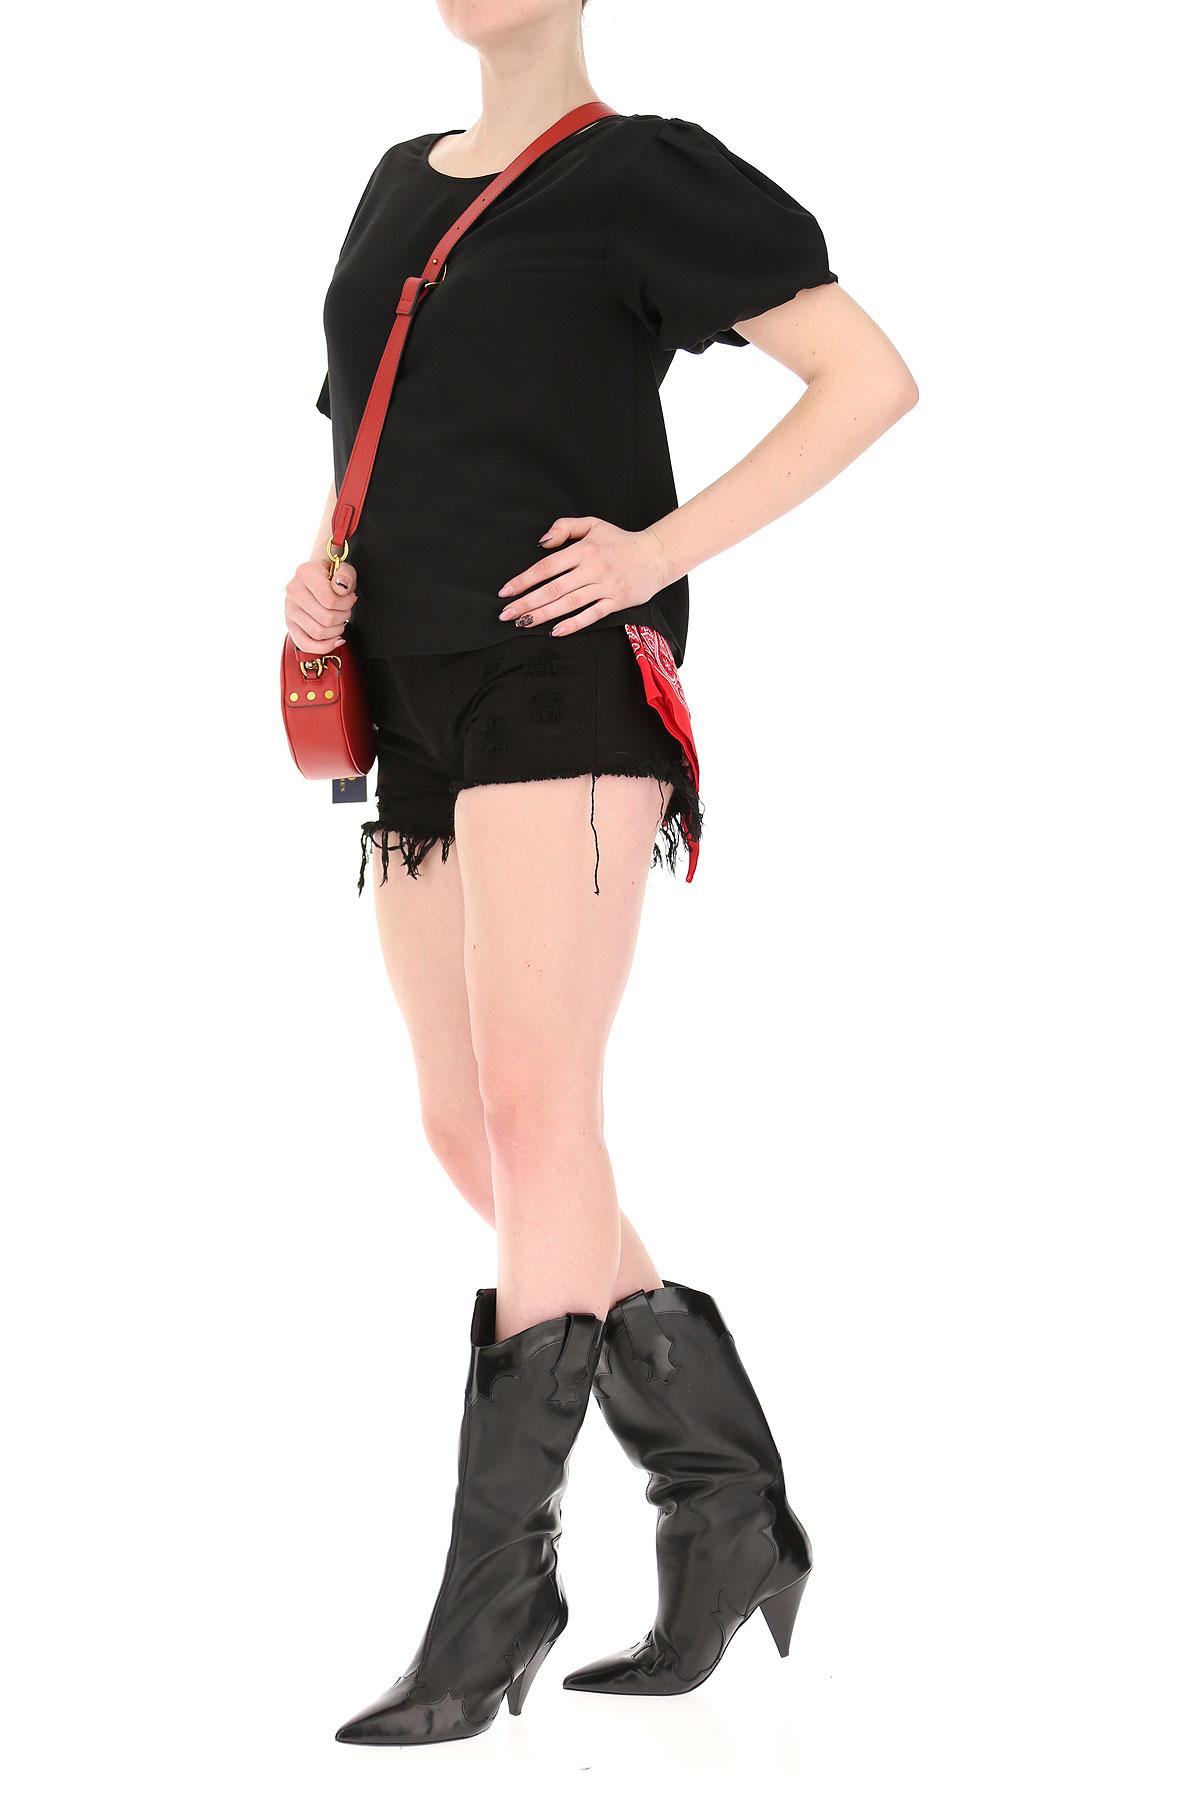 Marmi Para Orte 2019 Couture Negro nbsp; verano Mujer Primavera Ropa Dei 57q4HSnWqg